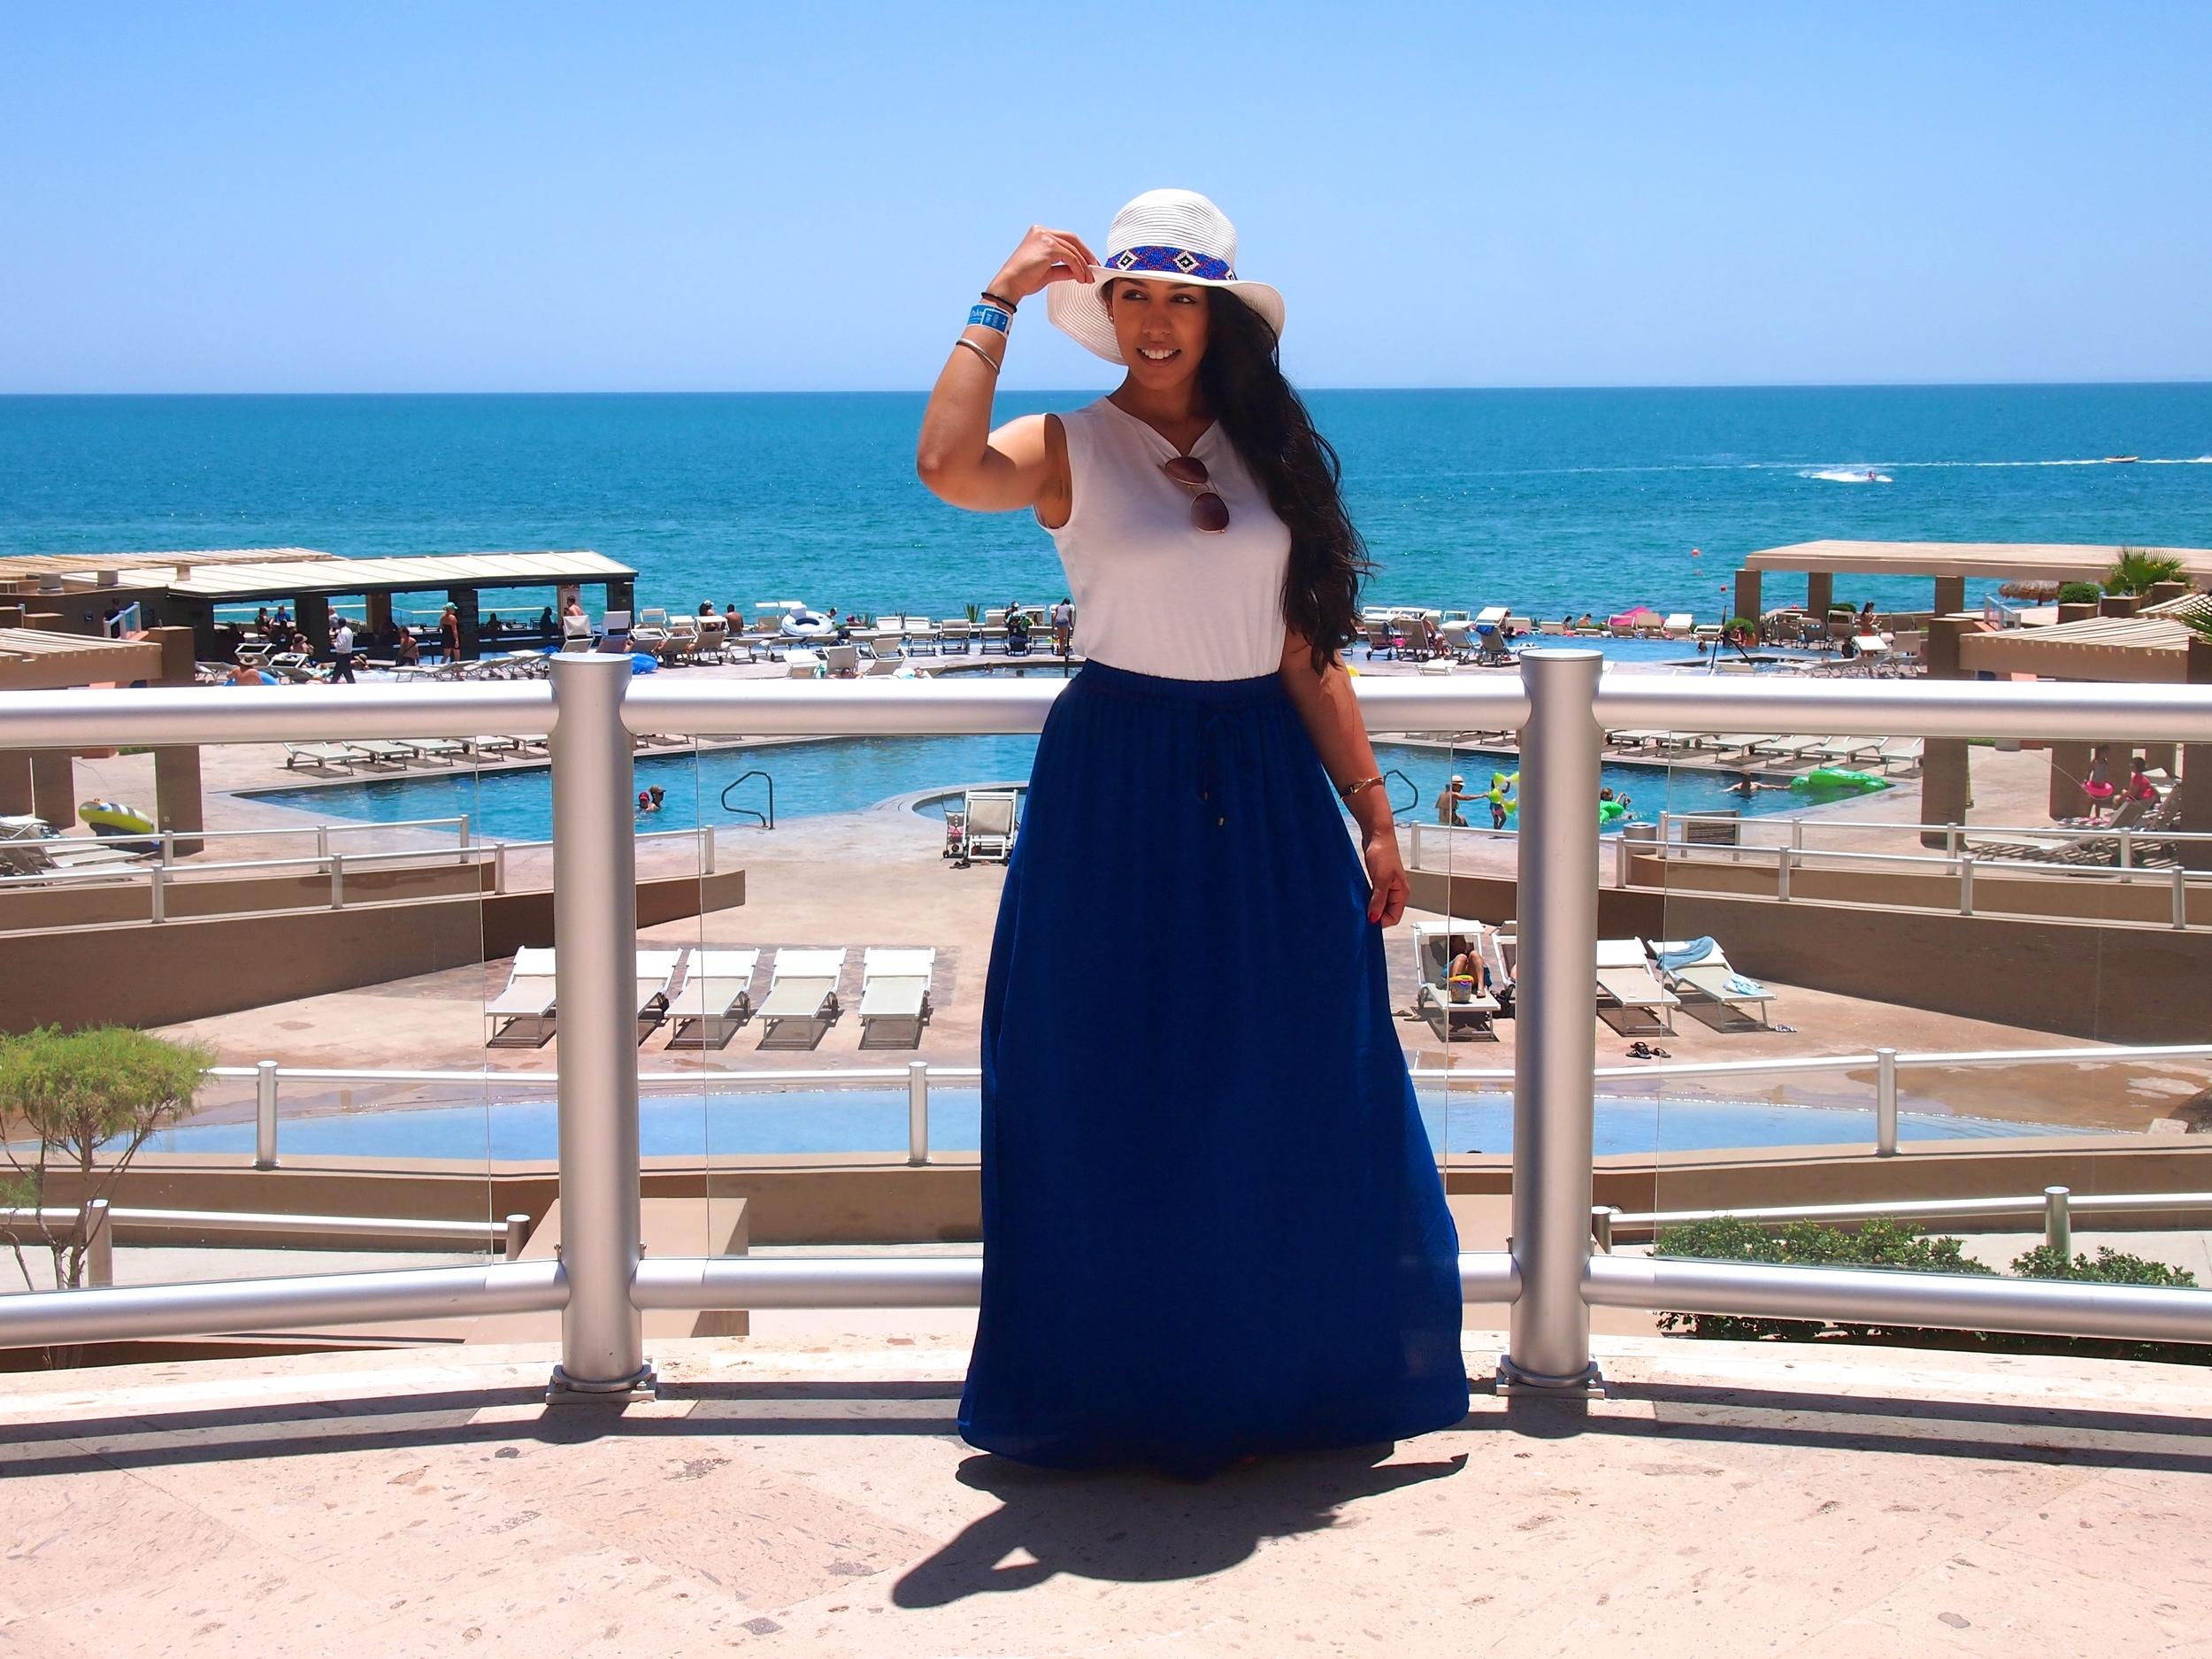 Vacation-Puerto-Penasco-Mexico.jpg